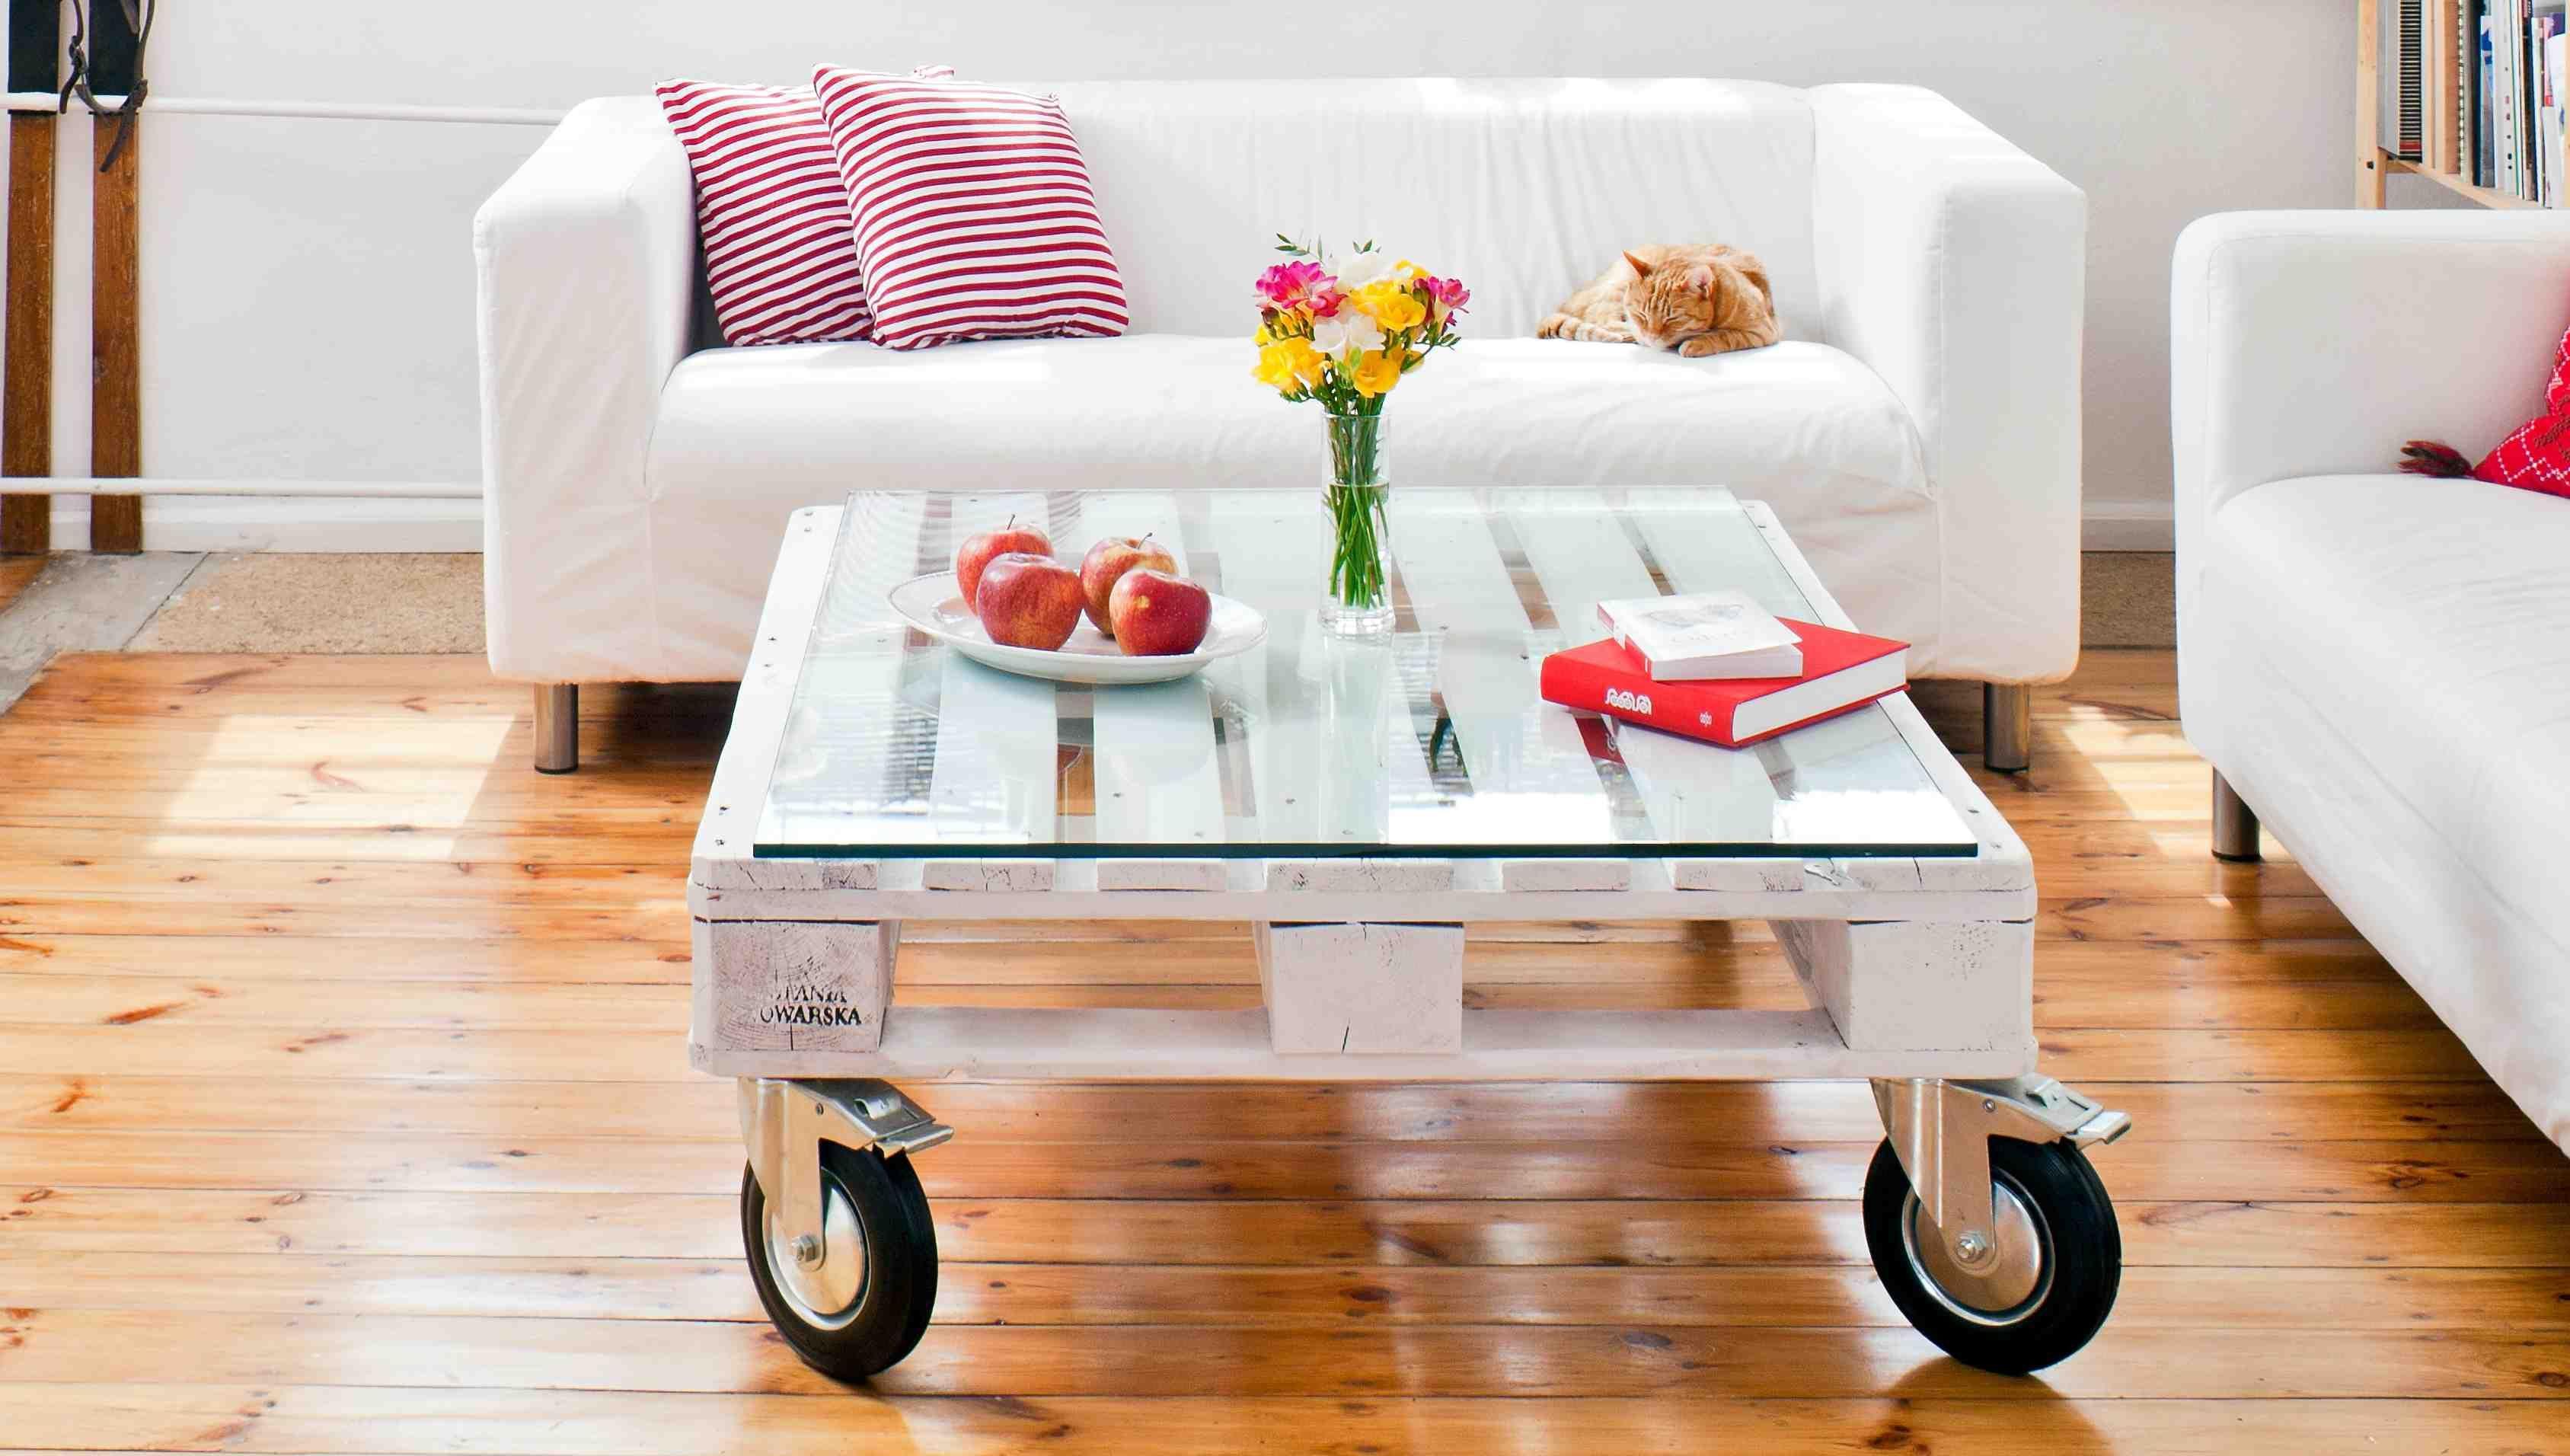 W Zrob To Sam Pomysl Na Meble Z Palet Ktore Staly Sie Popularne Z Palet Mozna Zrobic Naprawde Fajne Meble M Pallette Furniture Pallet Decor Pallet Furniture